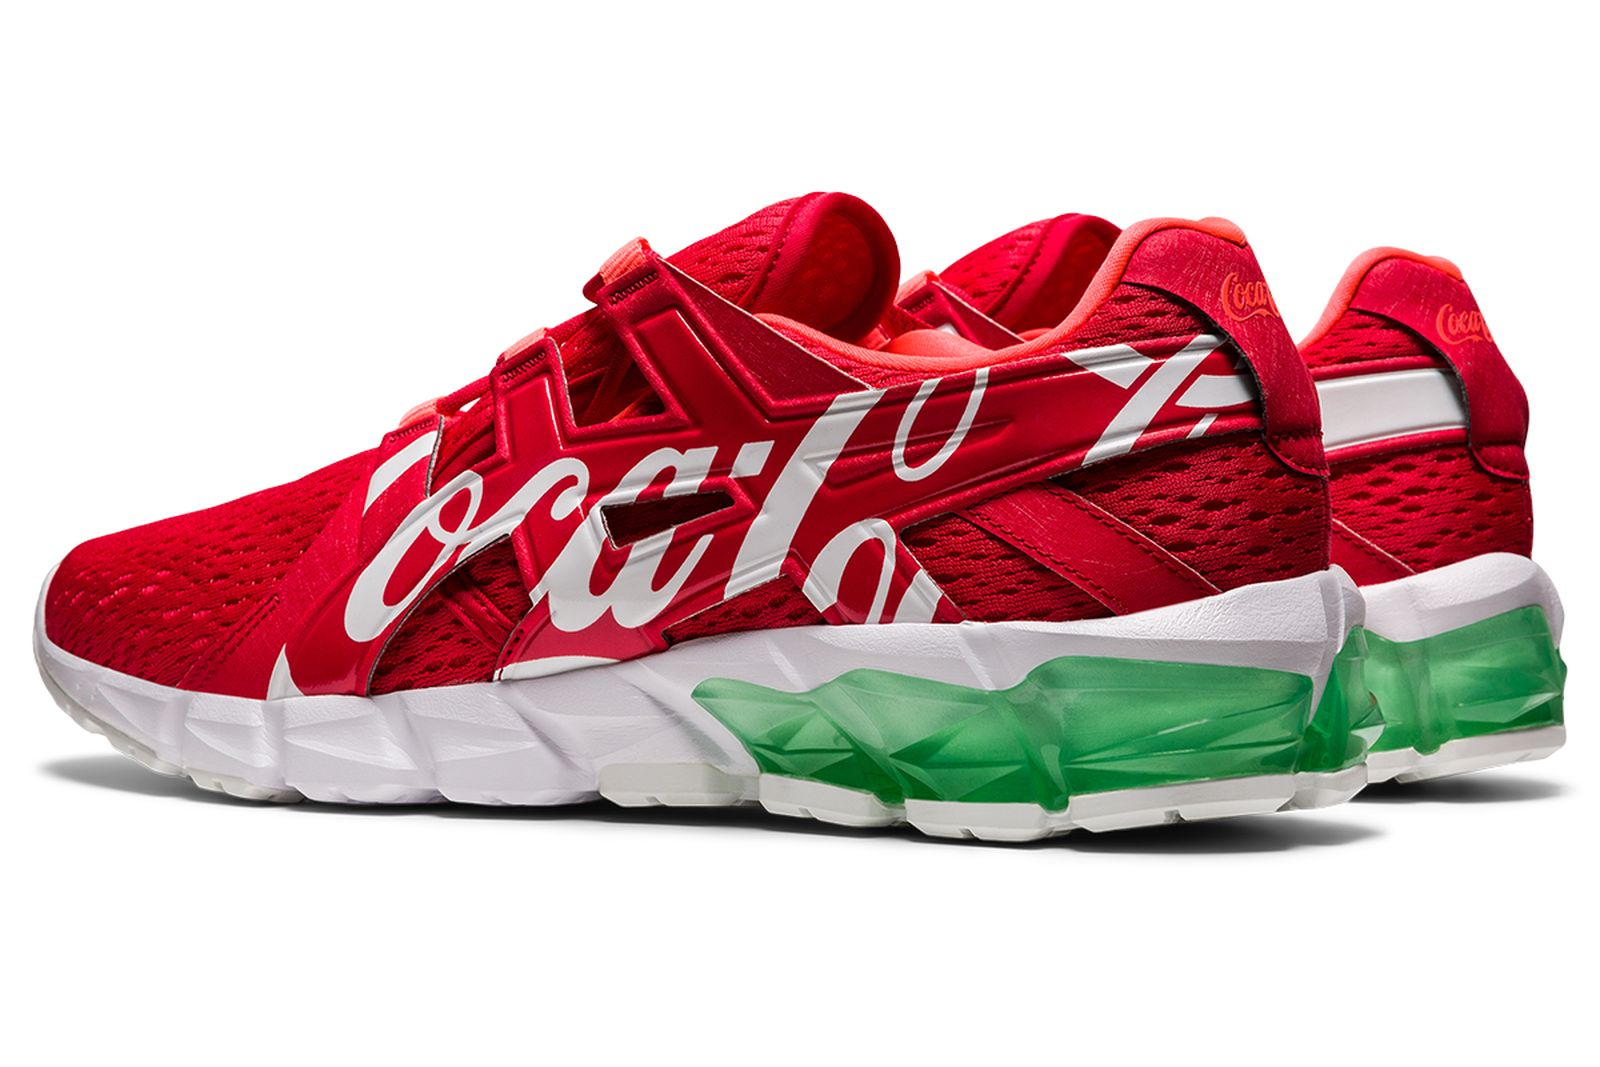 cola-asics-01